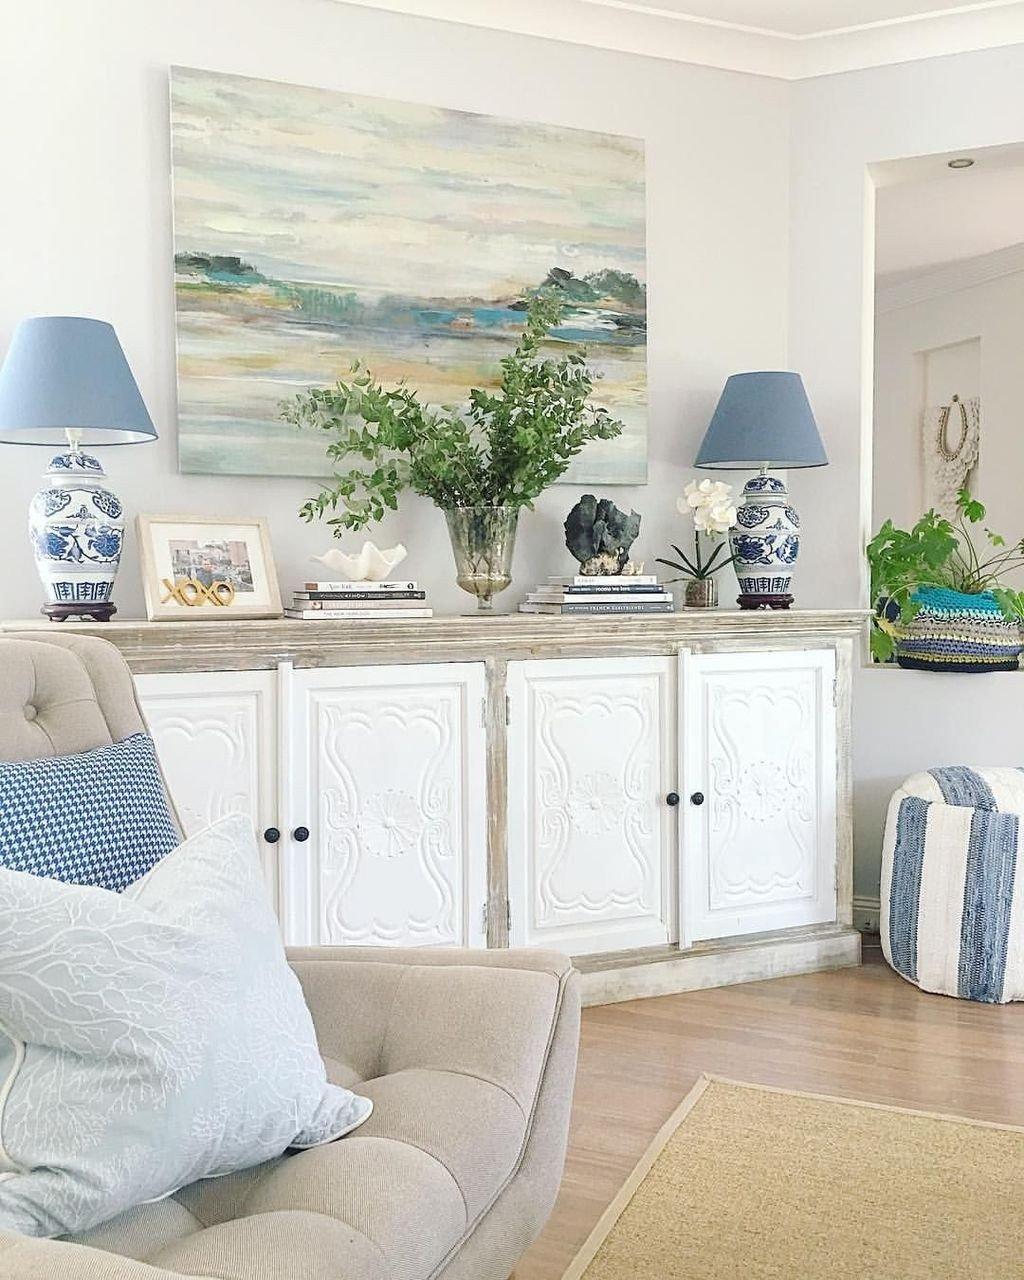 Coastal Comfortable Living Room Awesome 30 fortable Coastal Living Room Interior Ideas Decorating Ideas